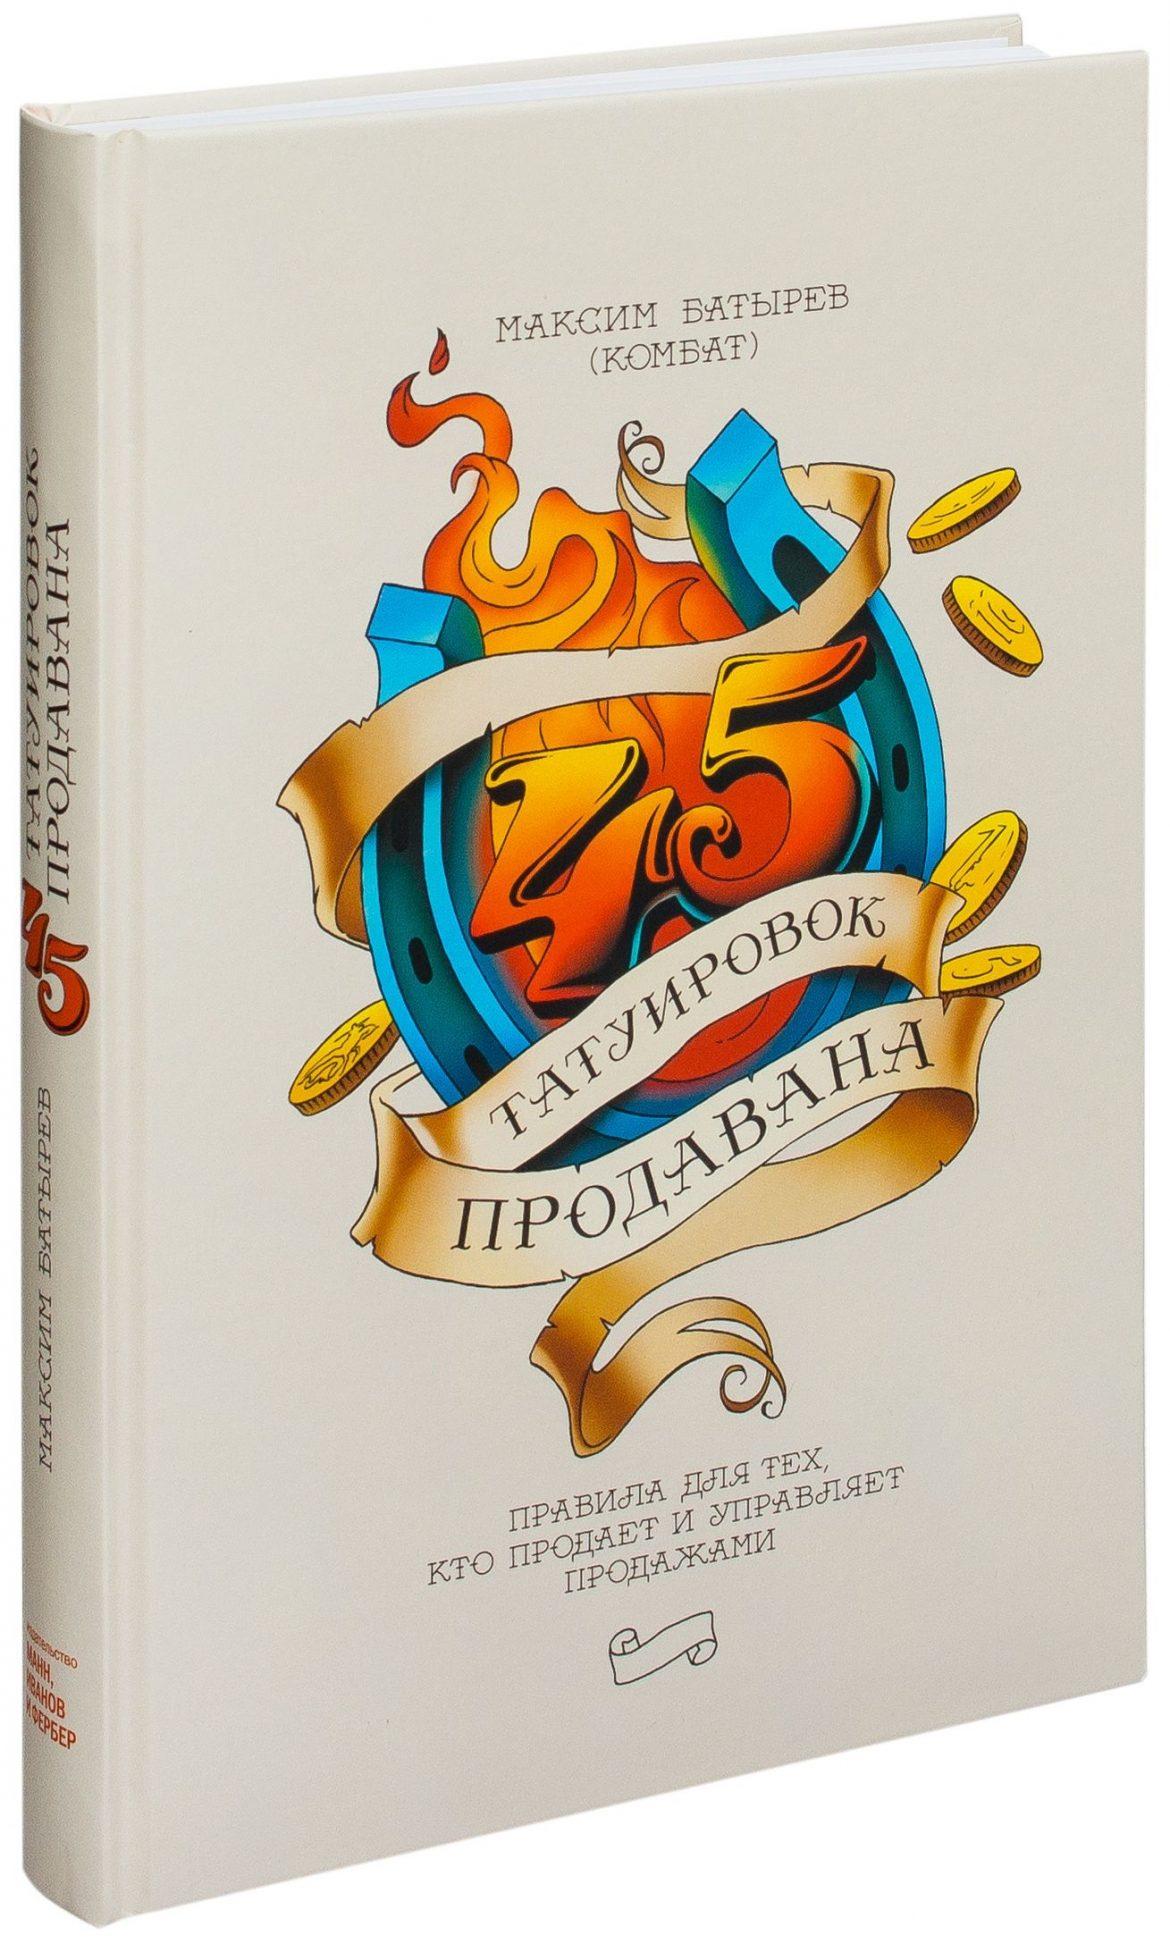 45 татуировок продавана — Максим Батырев